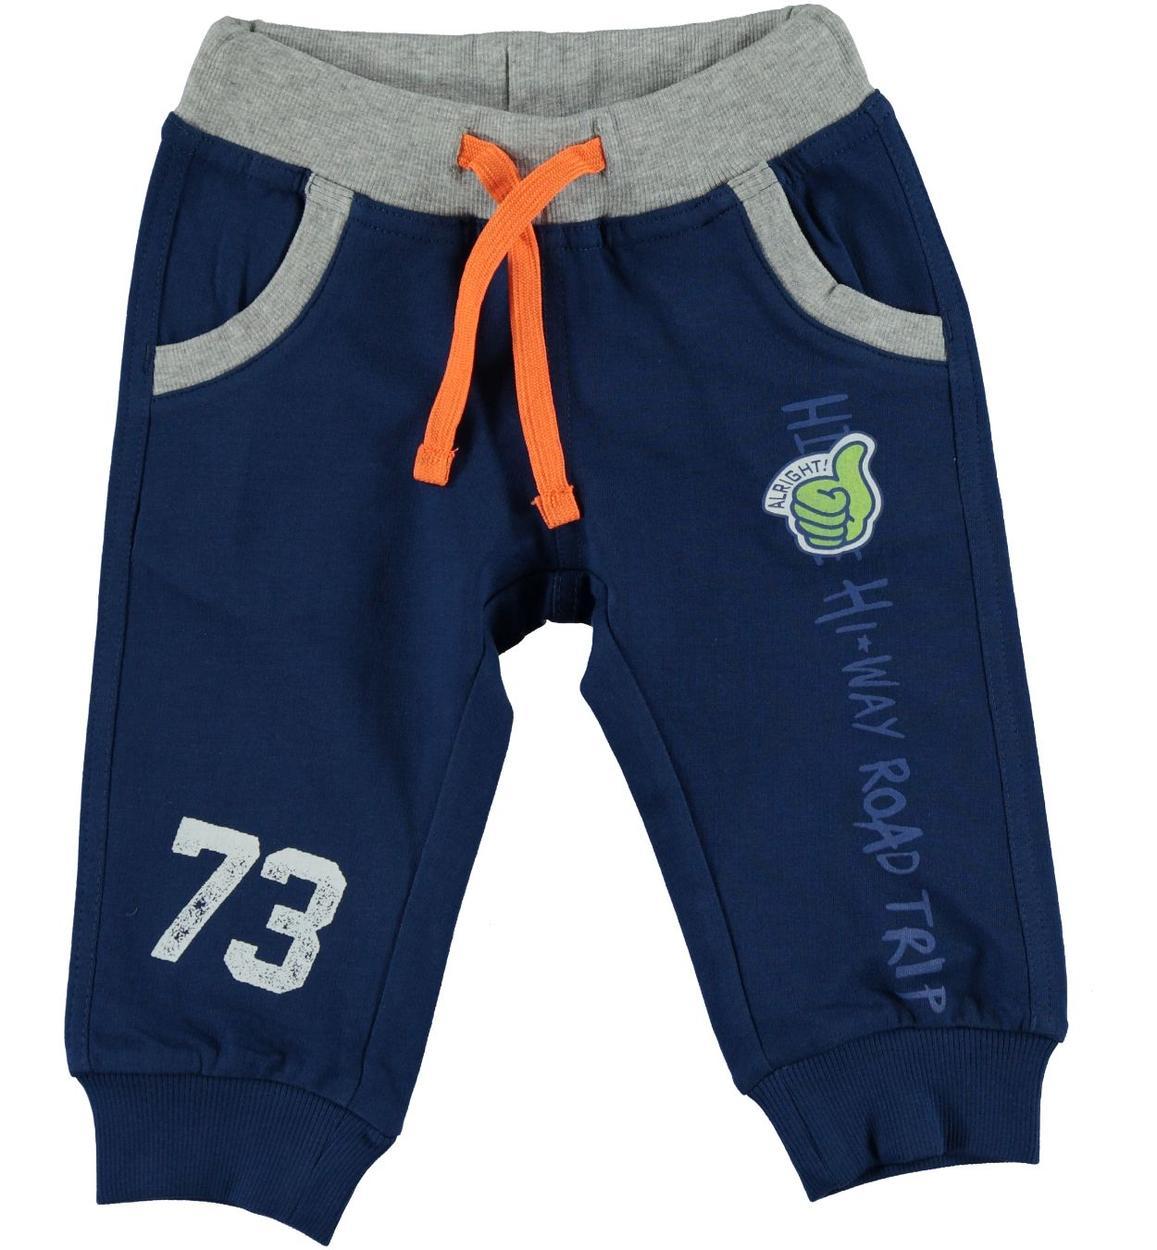 c4a5bb584c55 Pantalone sportivo in felpa leggera di cotone per bambino da 6 a 36 mesi iDO.  ROYAL-3735. BLU INDIGO-3647